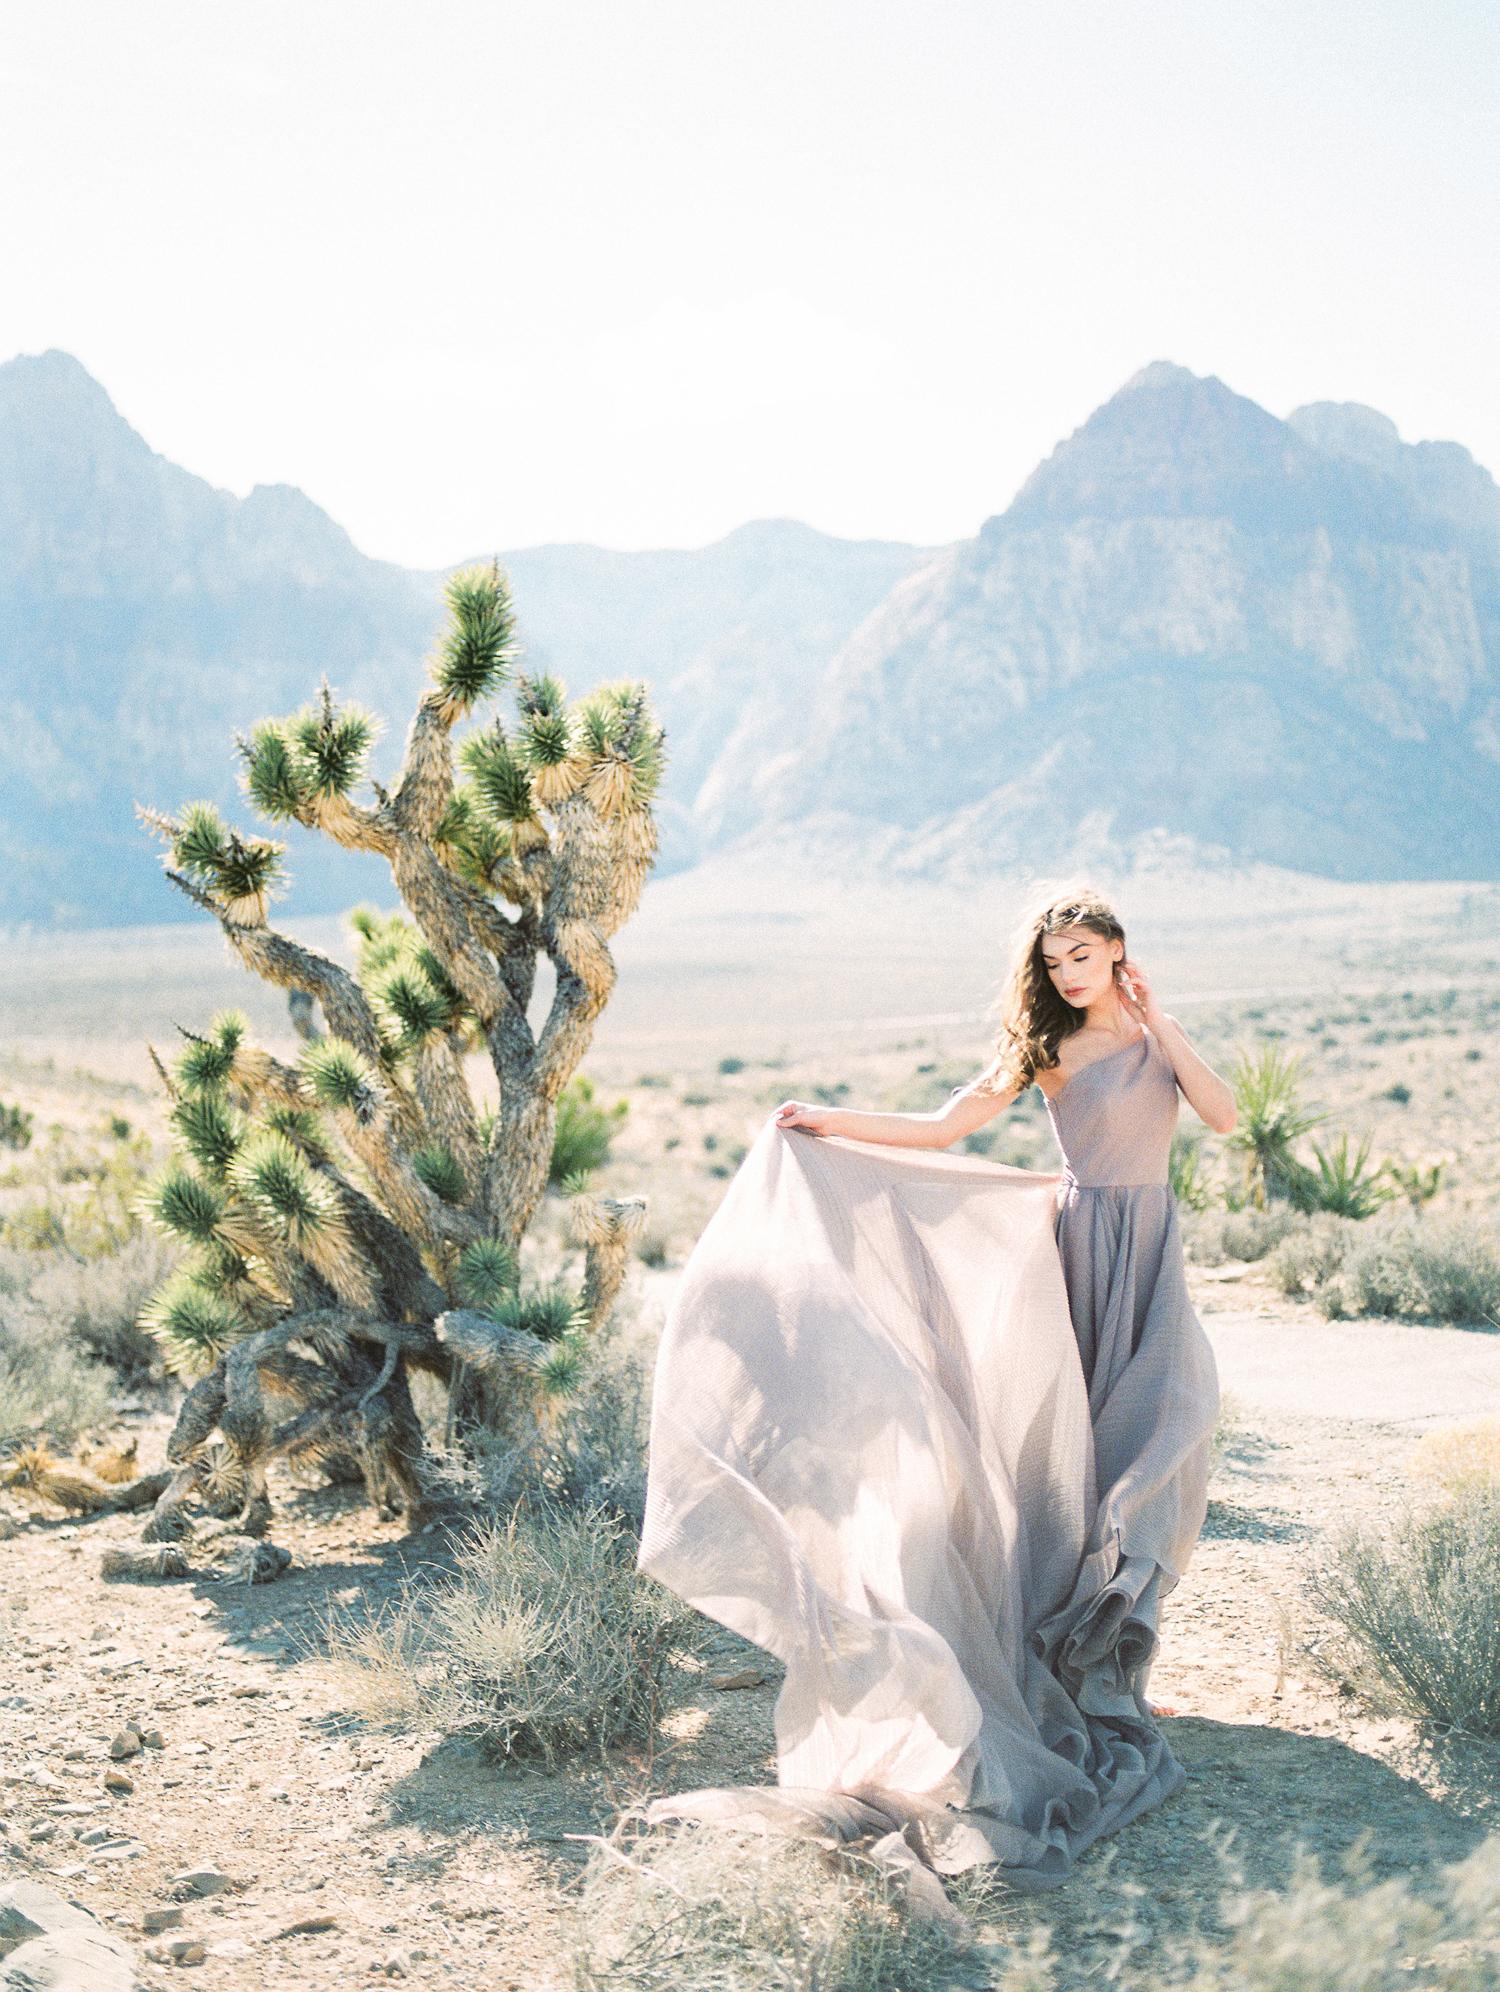 Brittany Bekas - Las Vegas Chicago Engagement Photographer-3.jpg